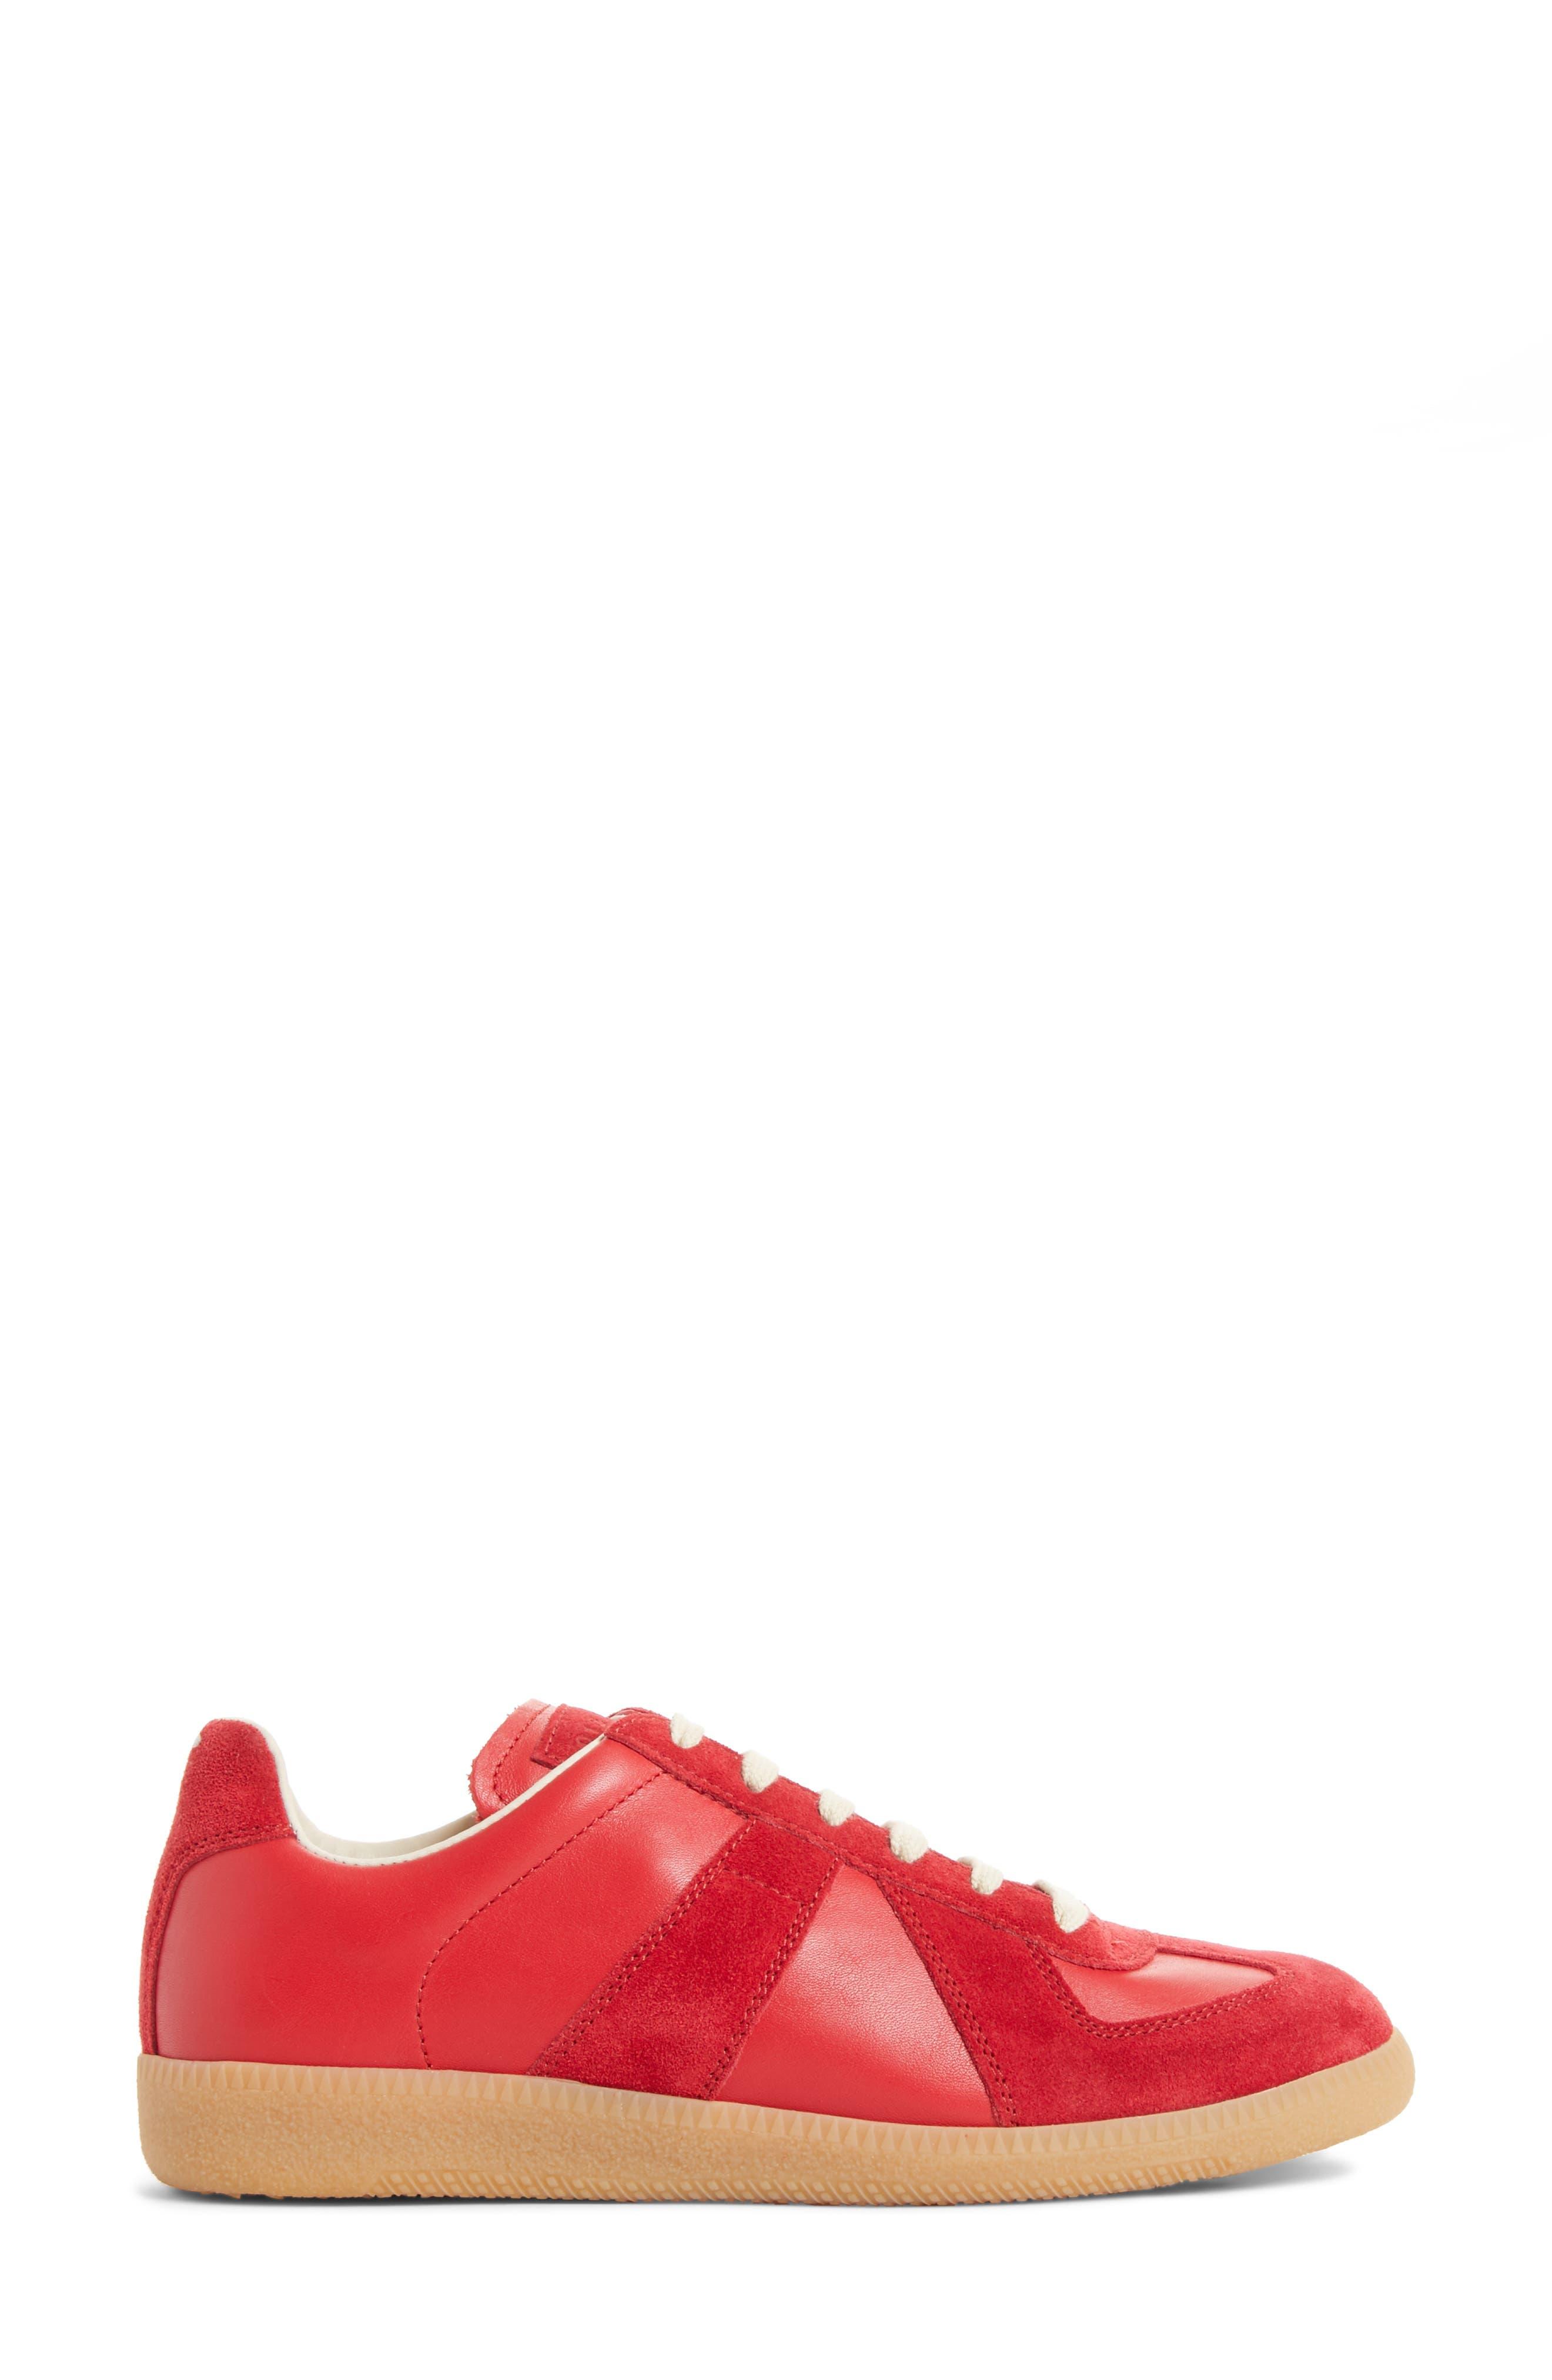 Replica Sneaker,                             Alternate thumbnail 3, color,                             Red/Amber